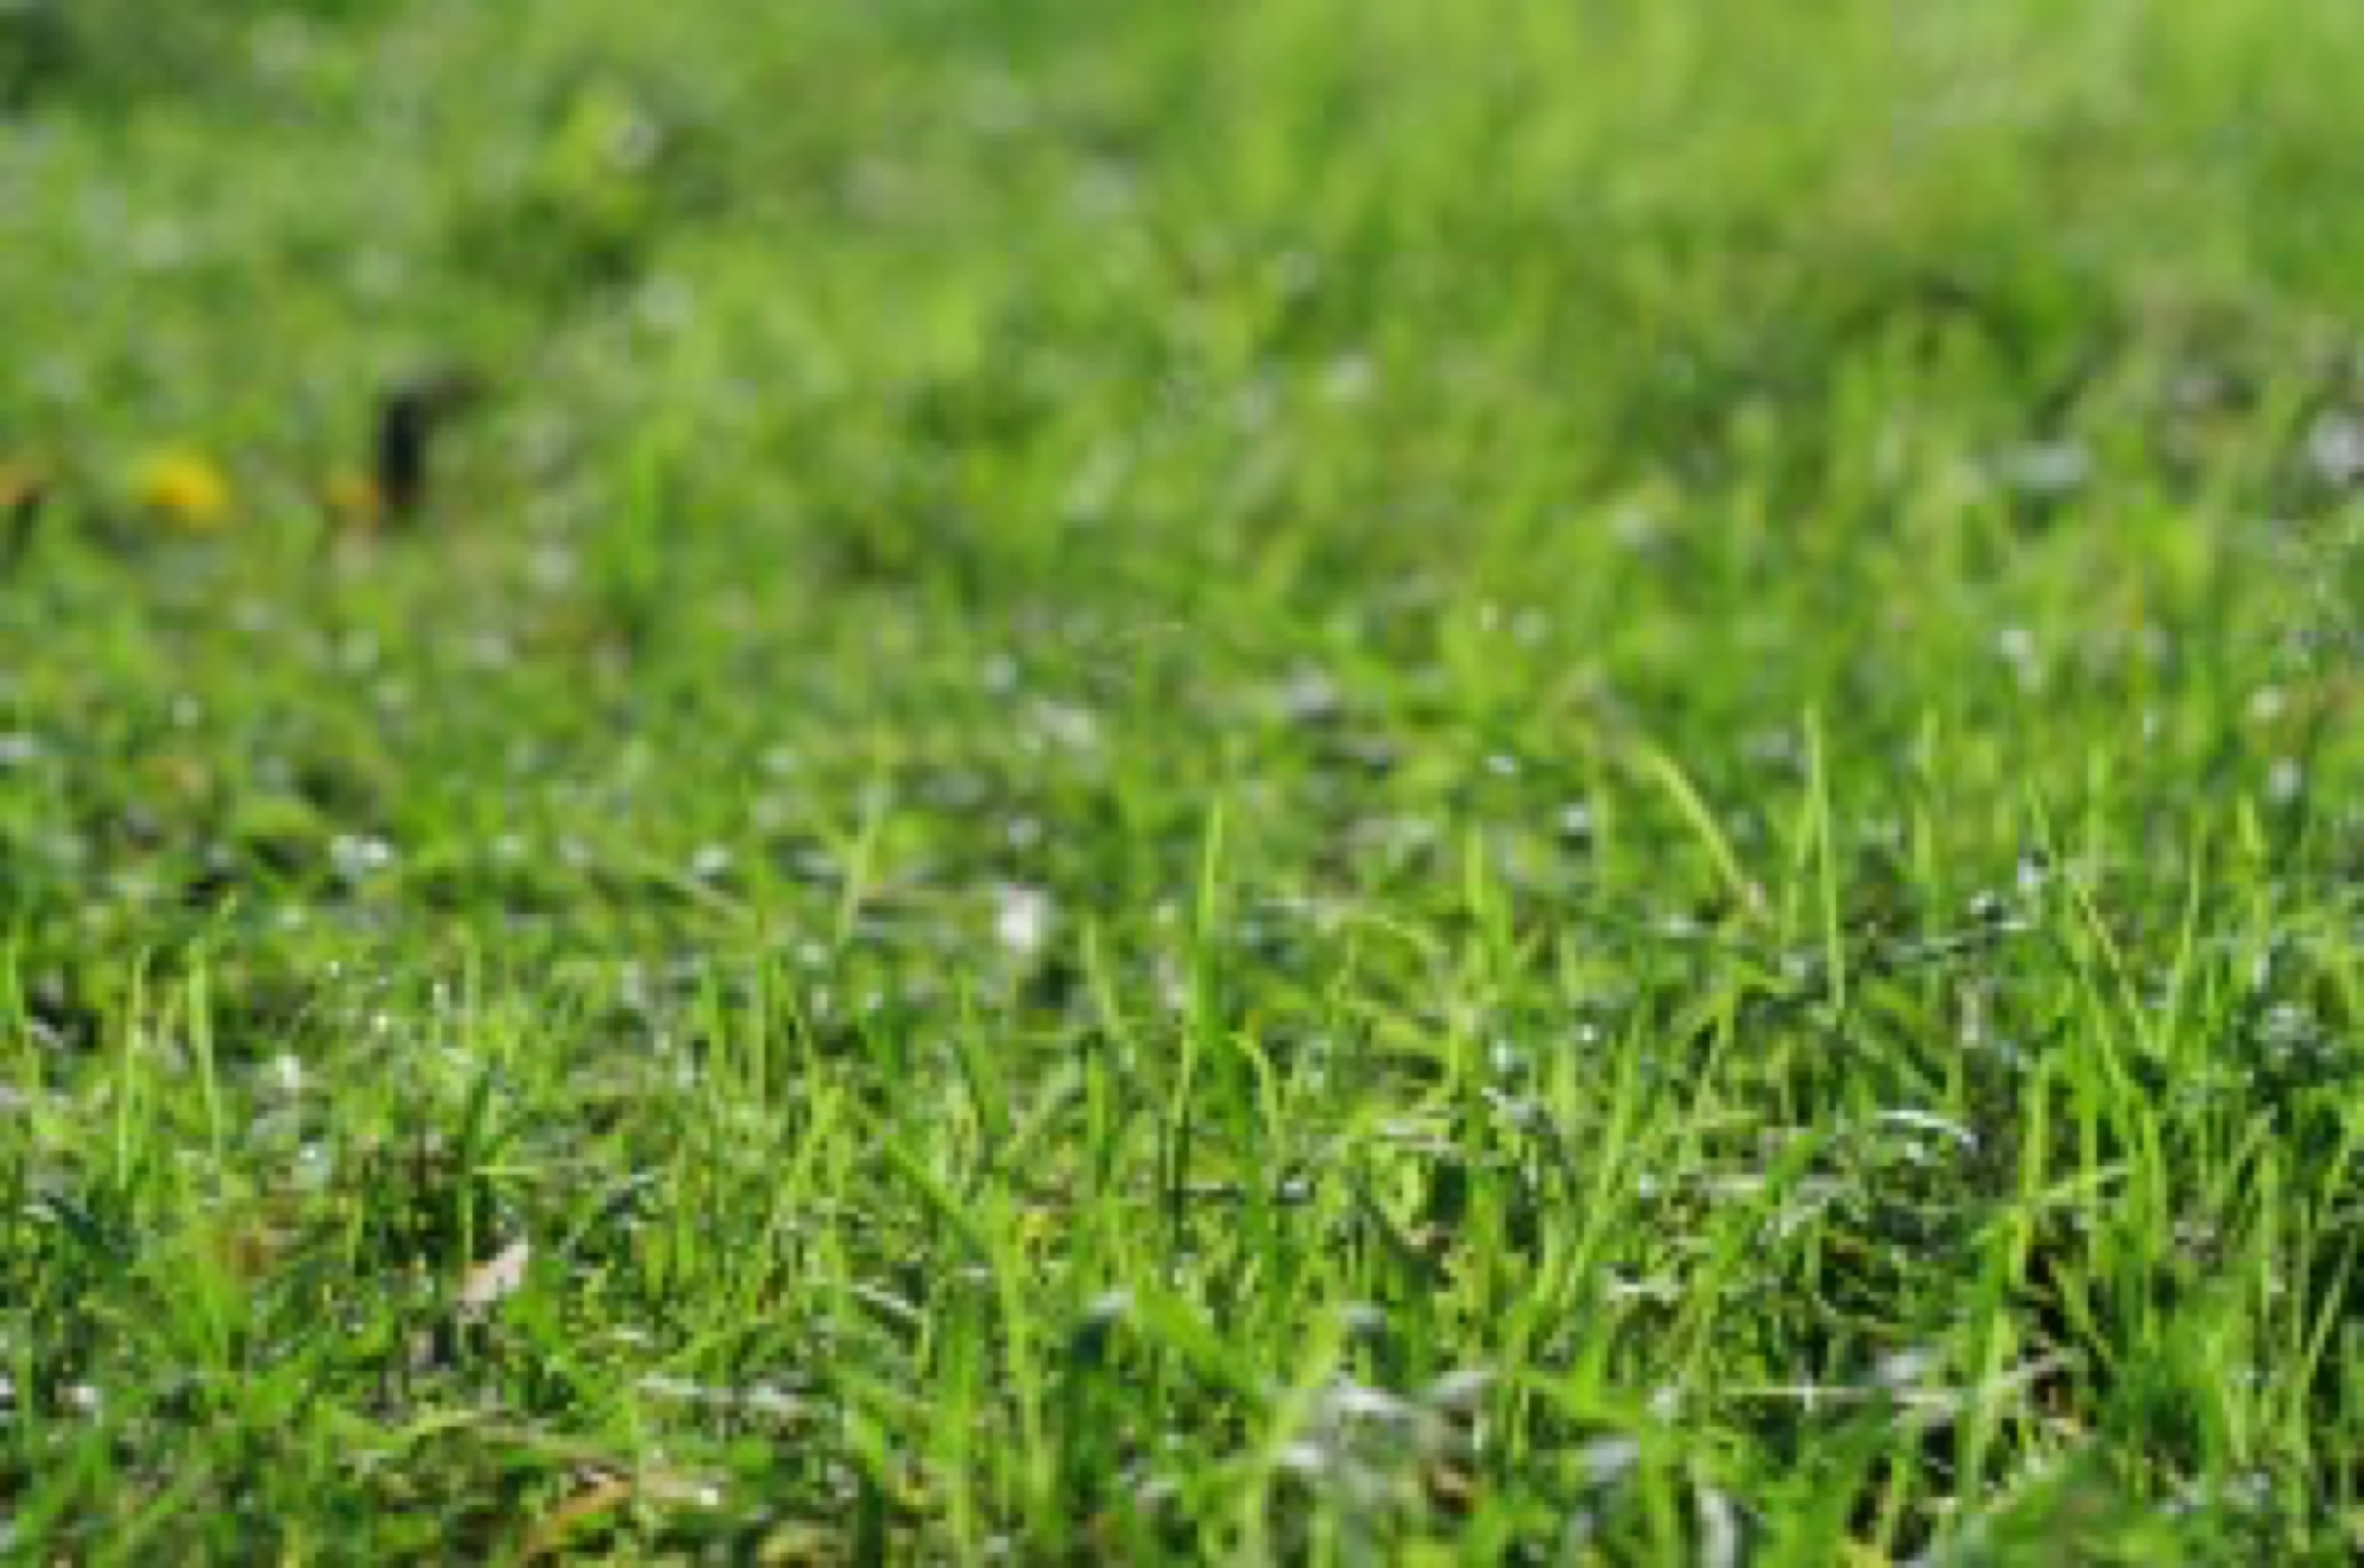 blog image - grass